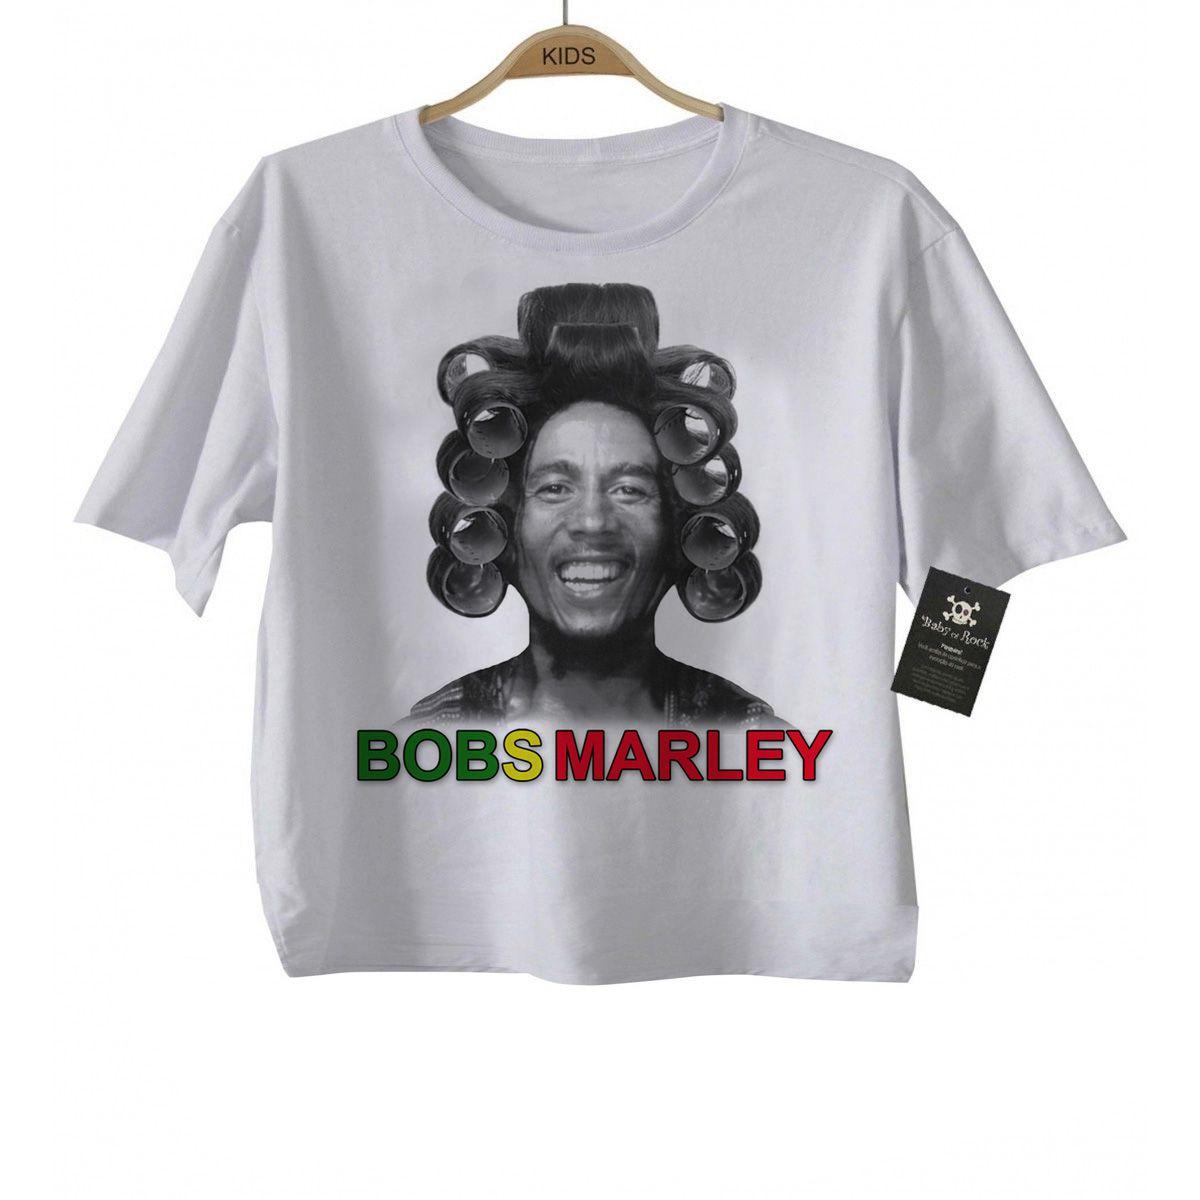 Camiseta Engraçada - BOBS MARLEY    - Baby Monster S/A